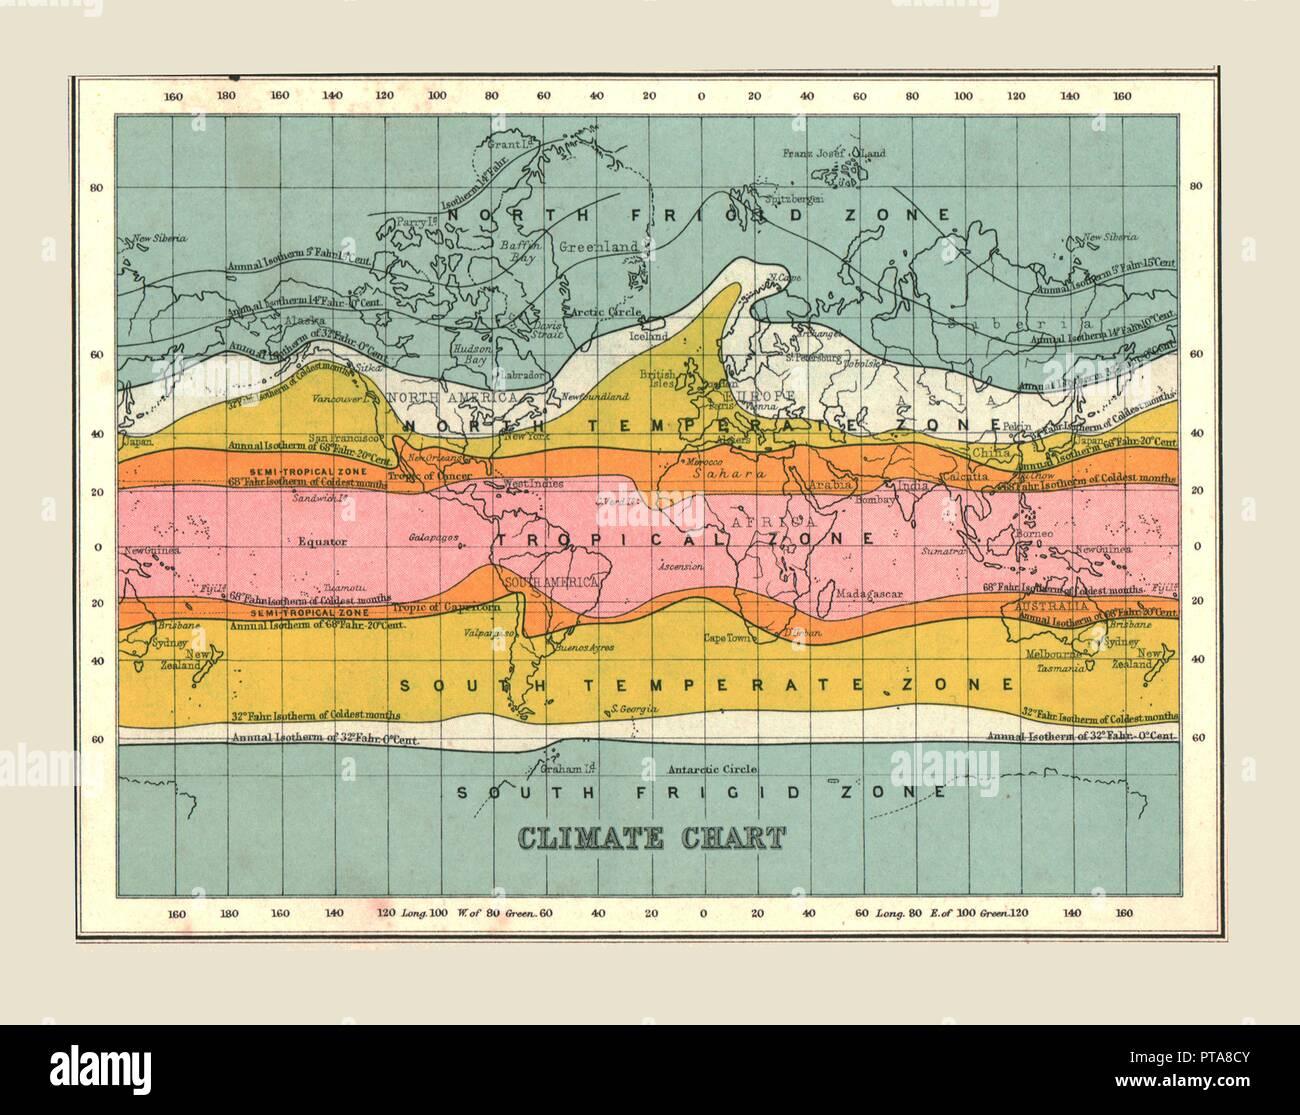 Mapa del mundo Clima gráfico, 1902. A partir del siglo Atlas del mundo. [John Walker &Amp; Co, Ltd., Londres, 1902] Imagen De Stock